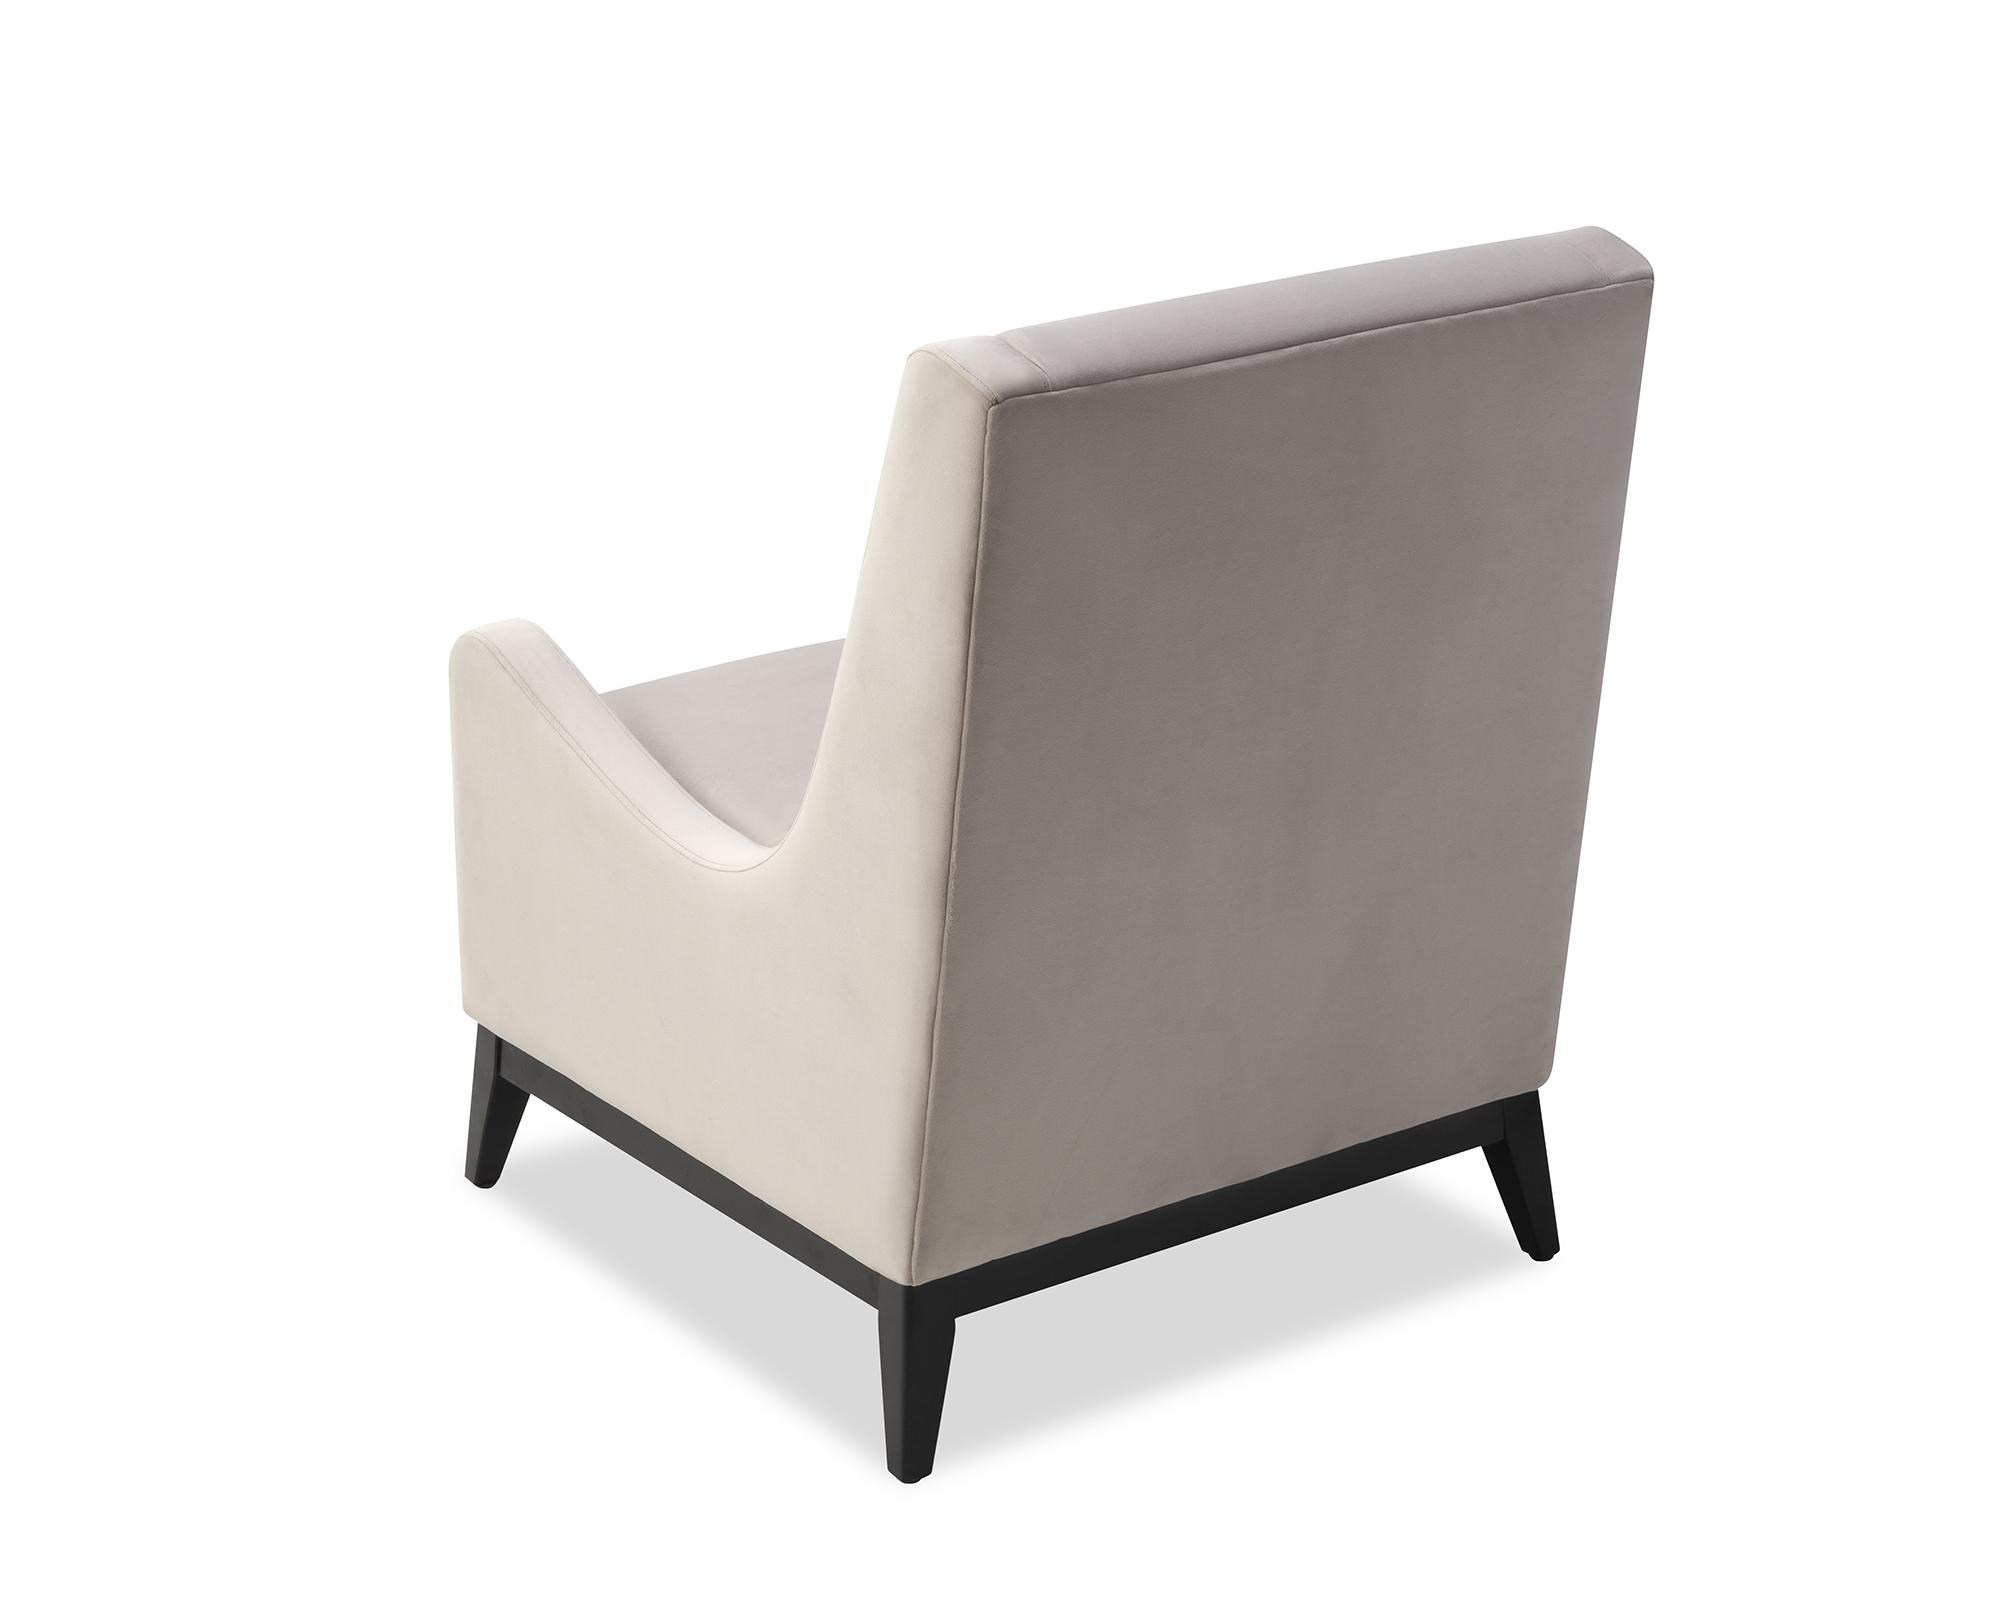 Liang & Eimil Lima Occasional Chair Limestone Velvet BH-OCH-089 (4)